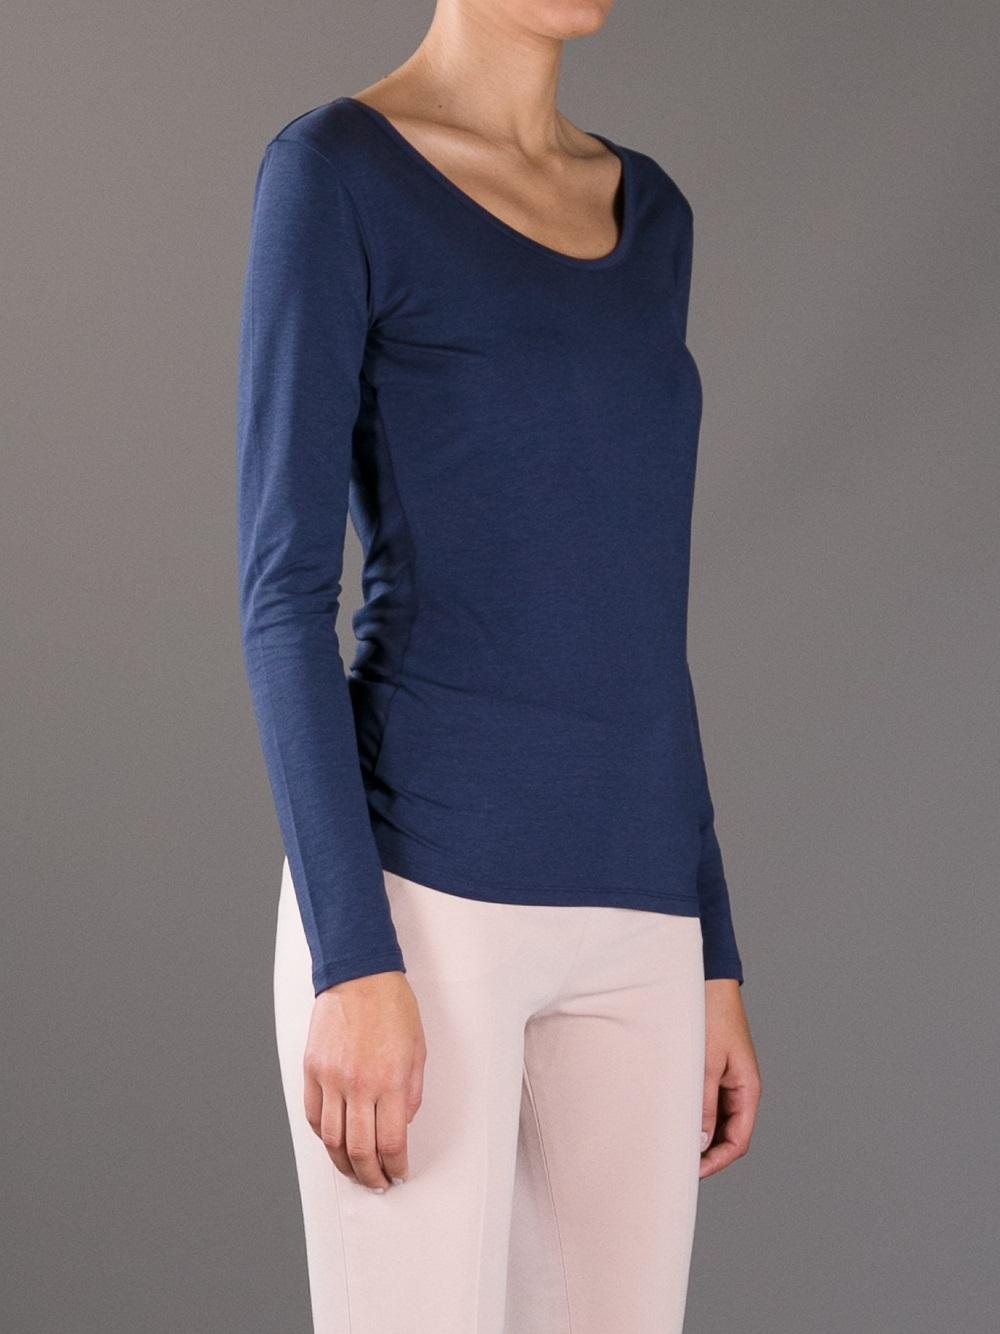 weekend by maxmara multib long sleeve tshirt in blue lyst